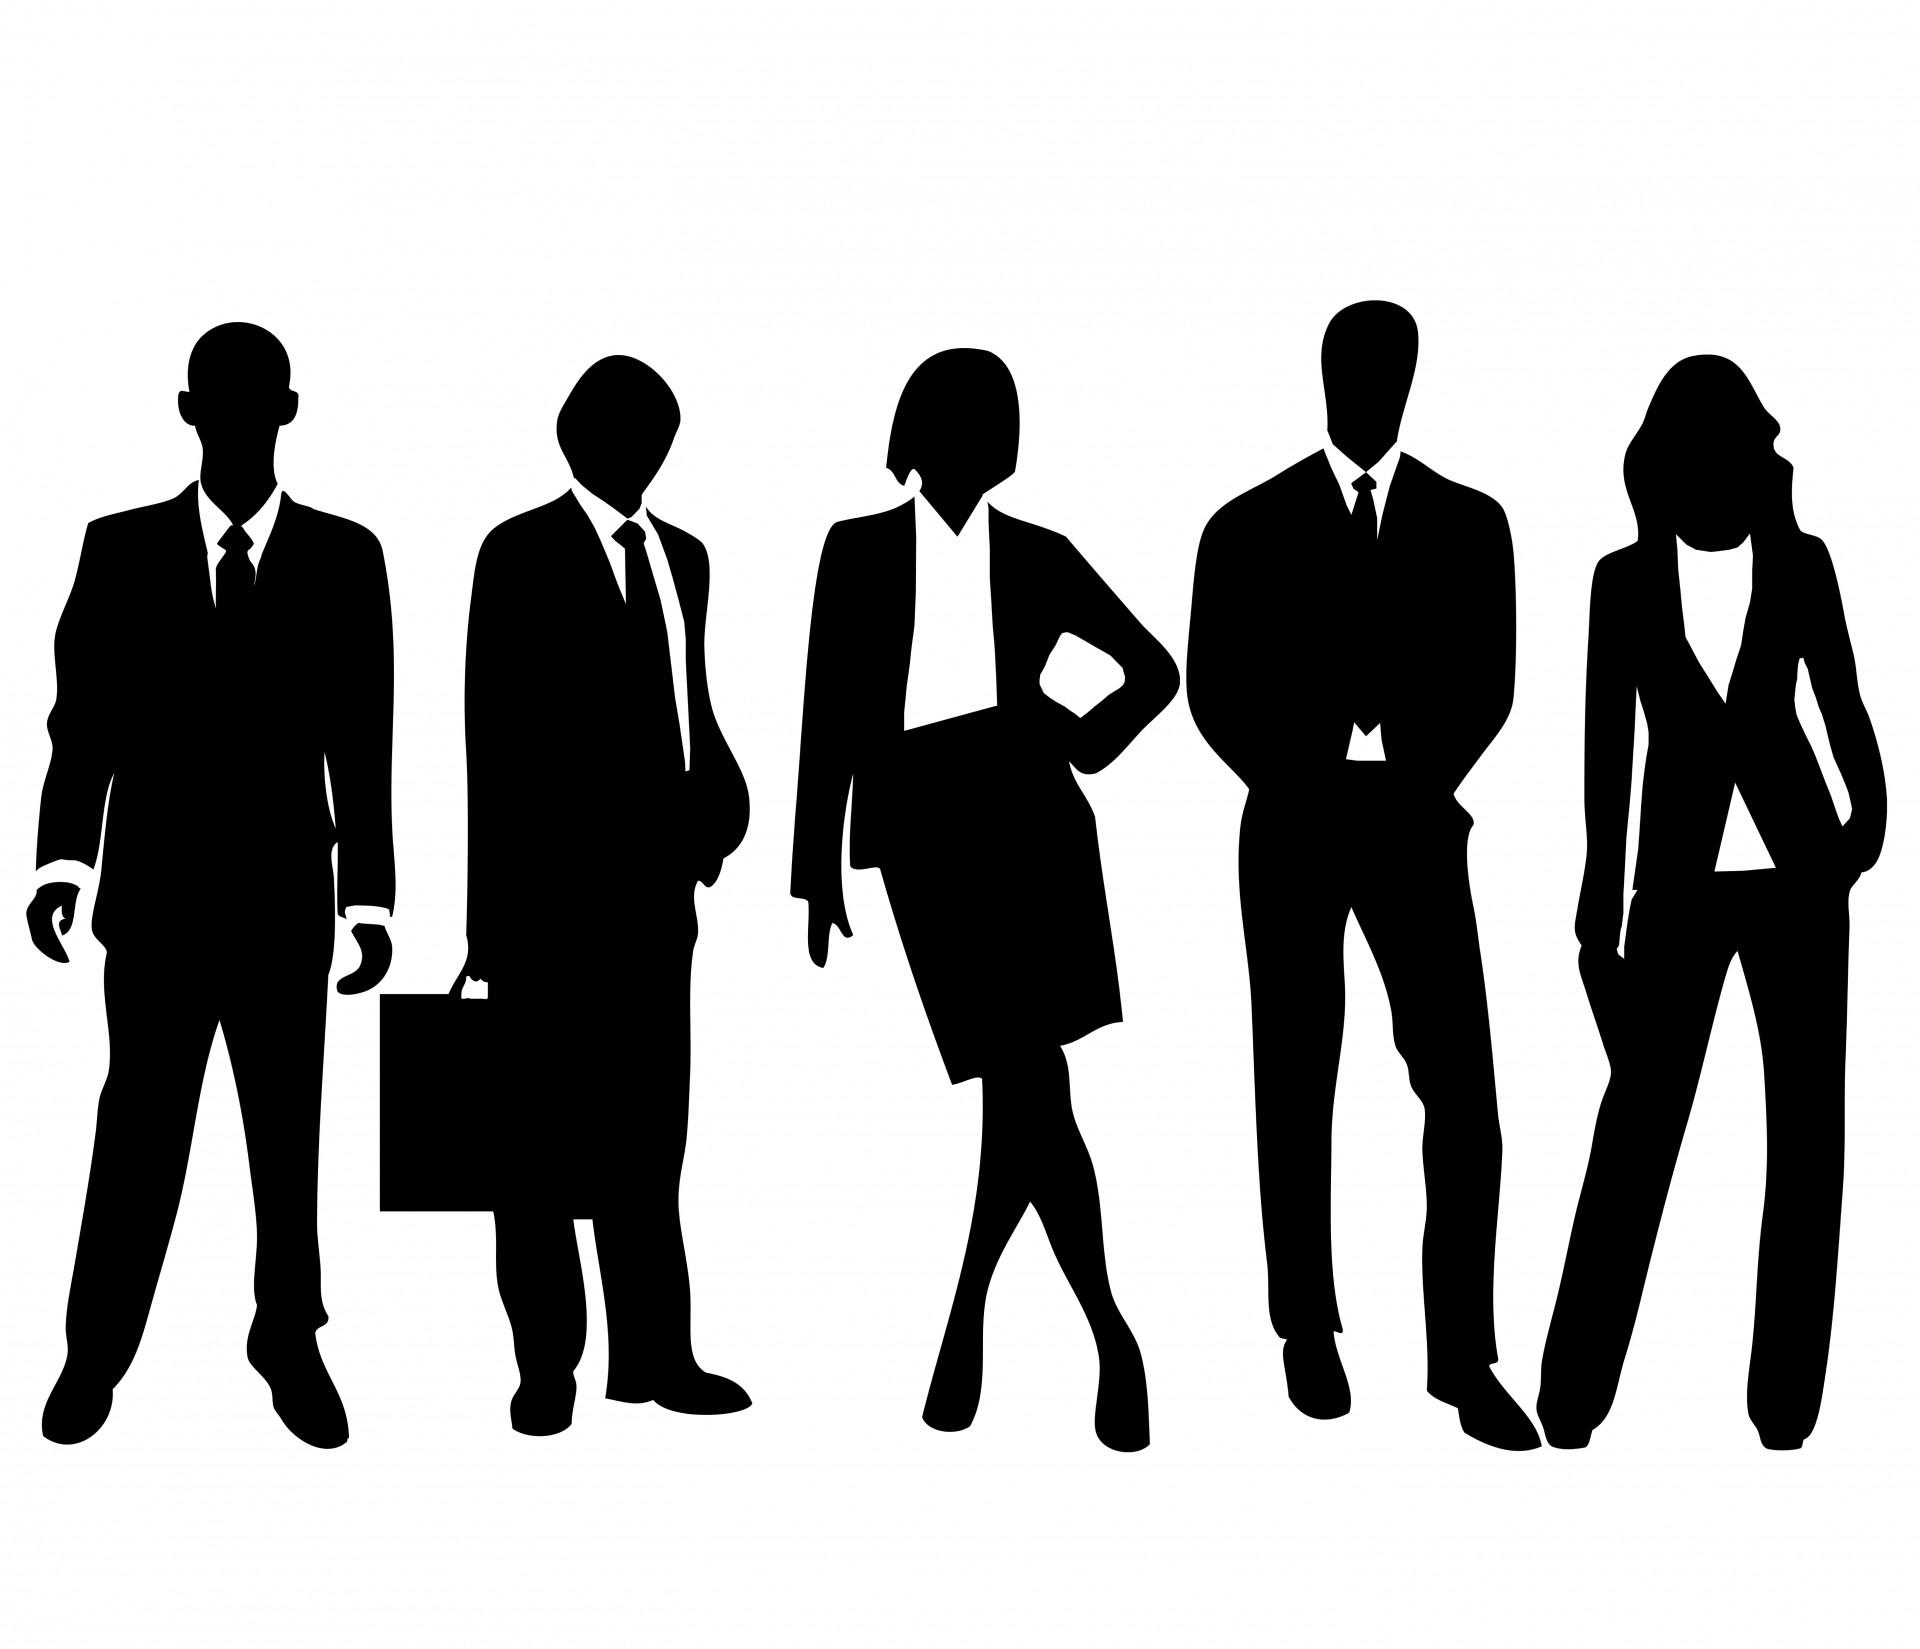 Business clip art free clipart images